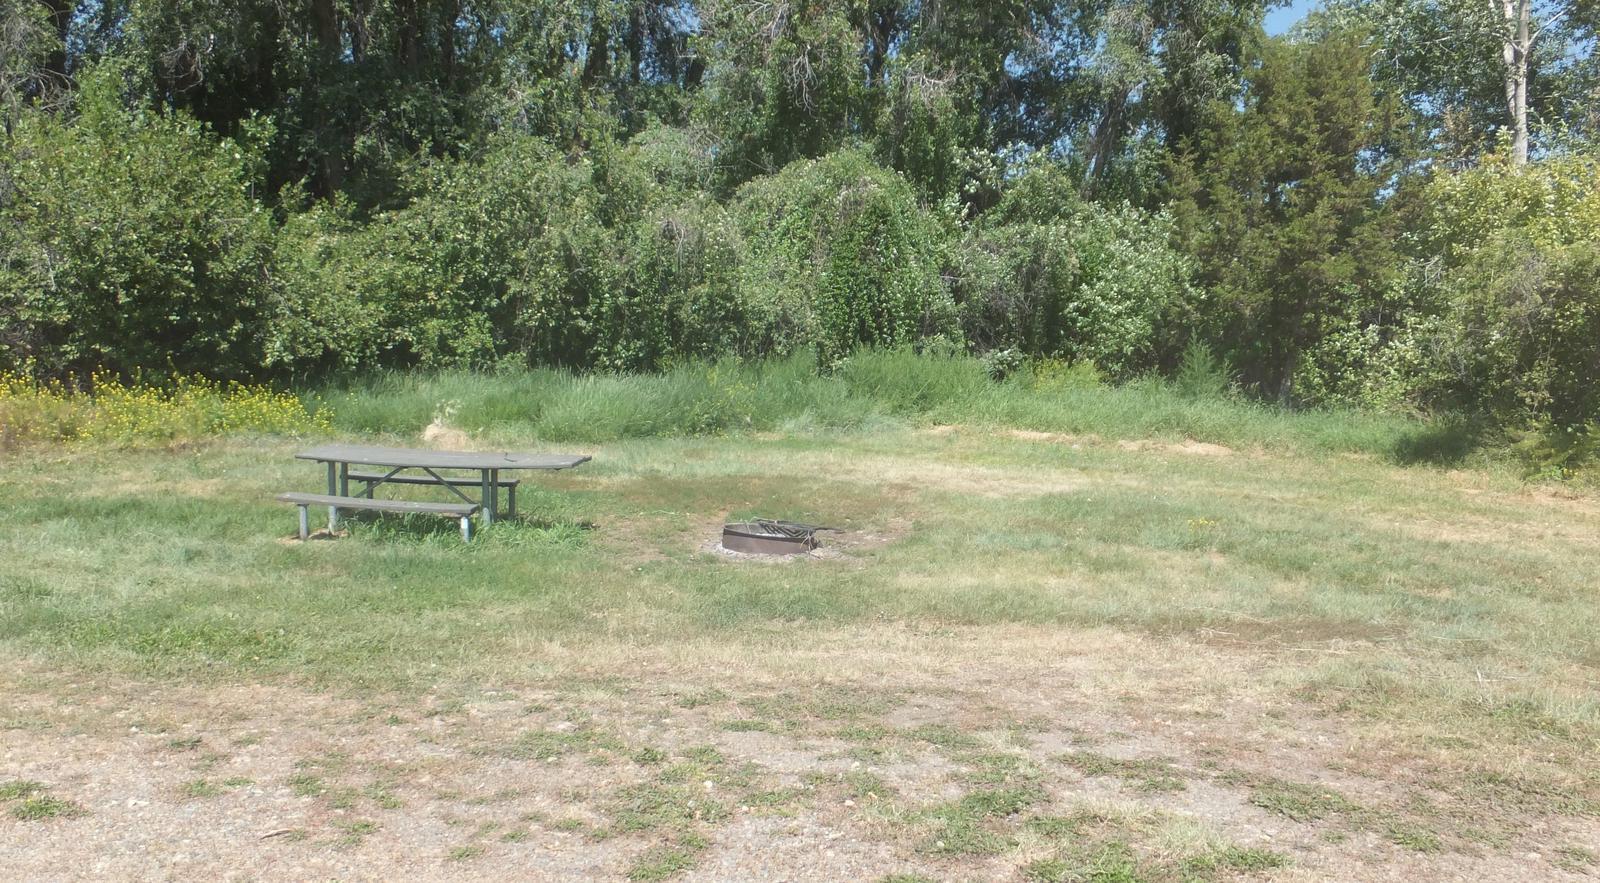 Hellgate Campground - Campsite 5